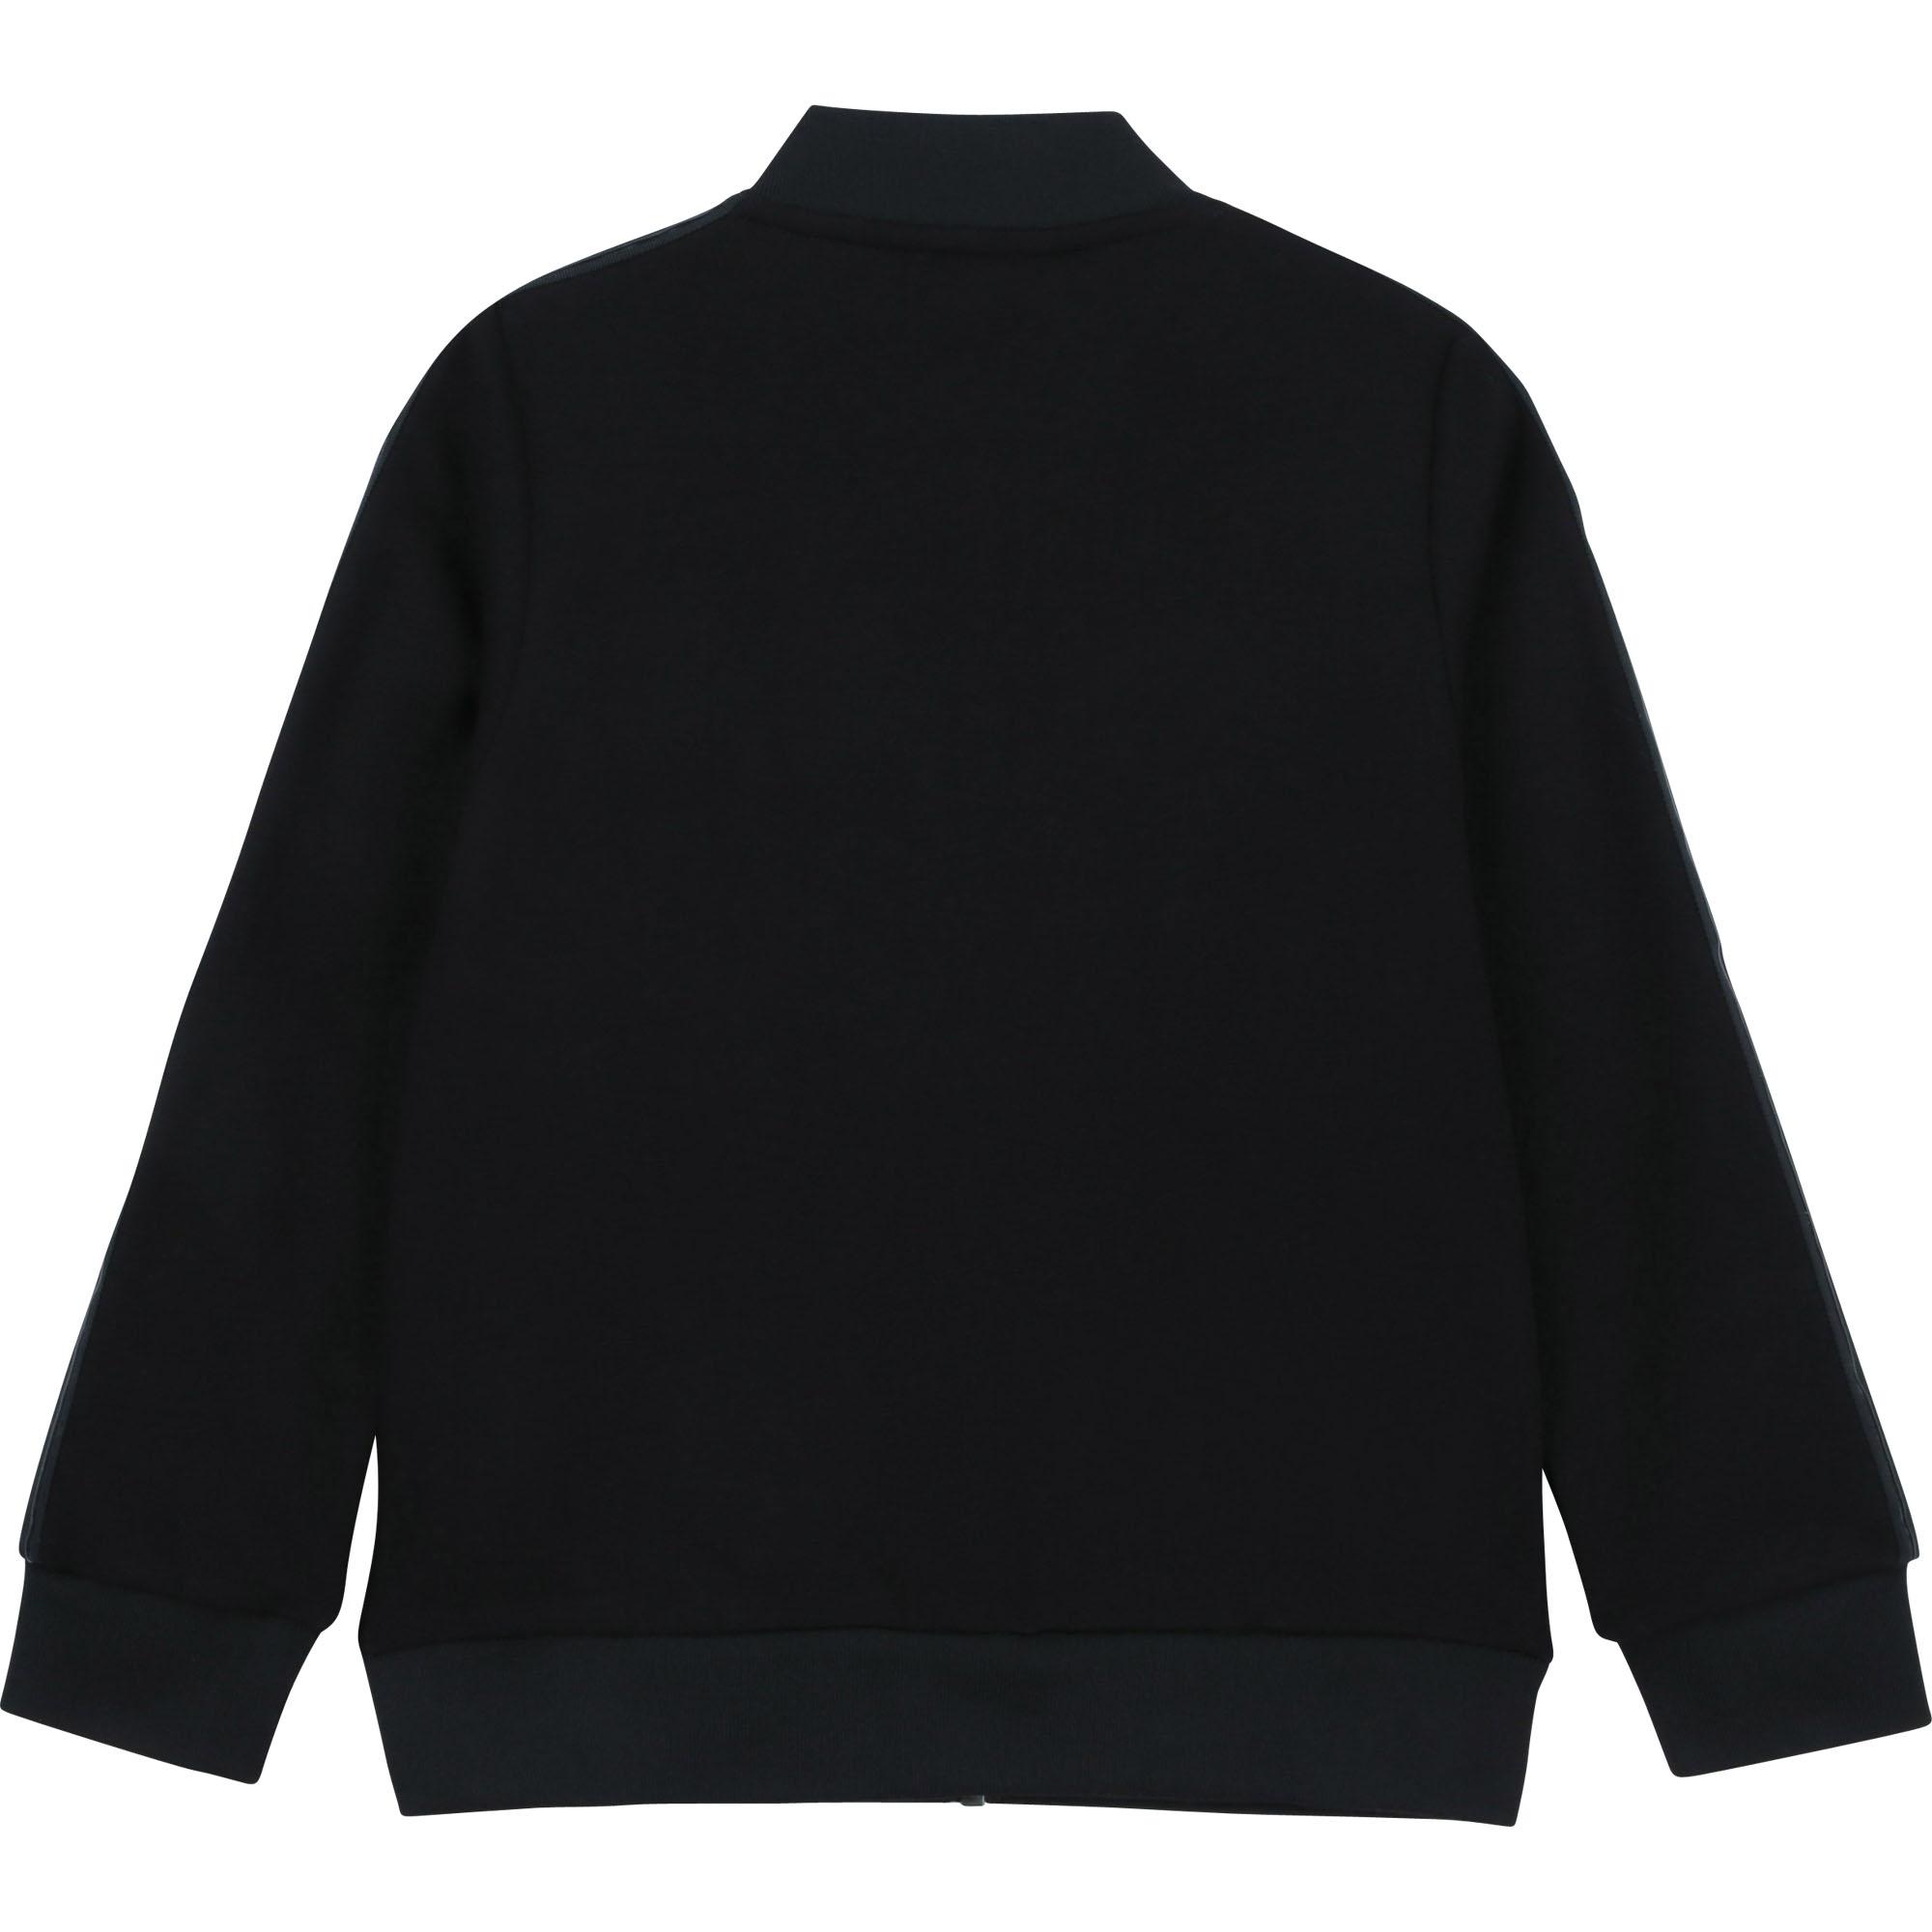 Zip-up cotton cardigan KARL LAGERFELD KIDS for BOY